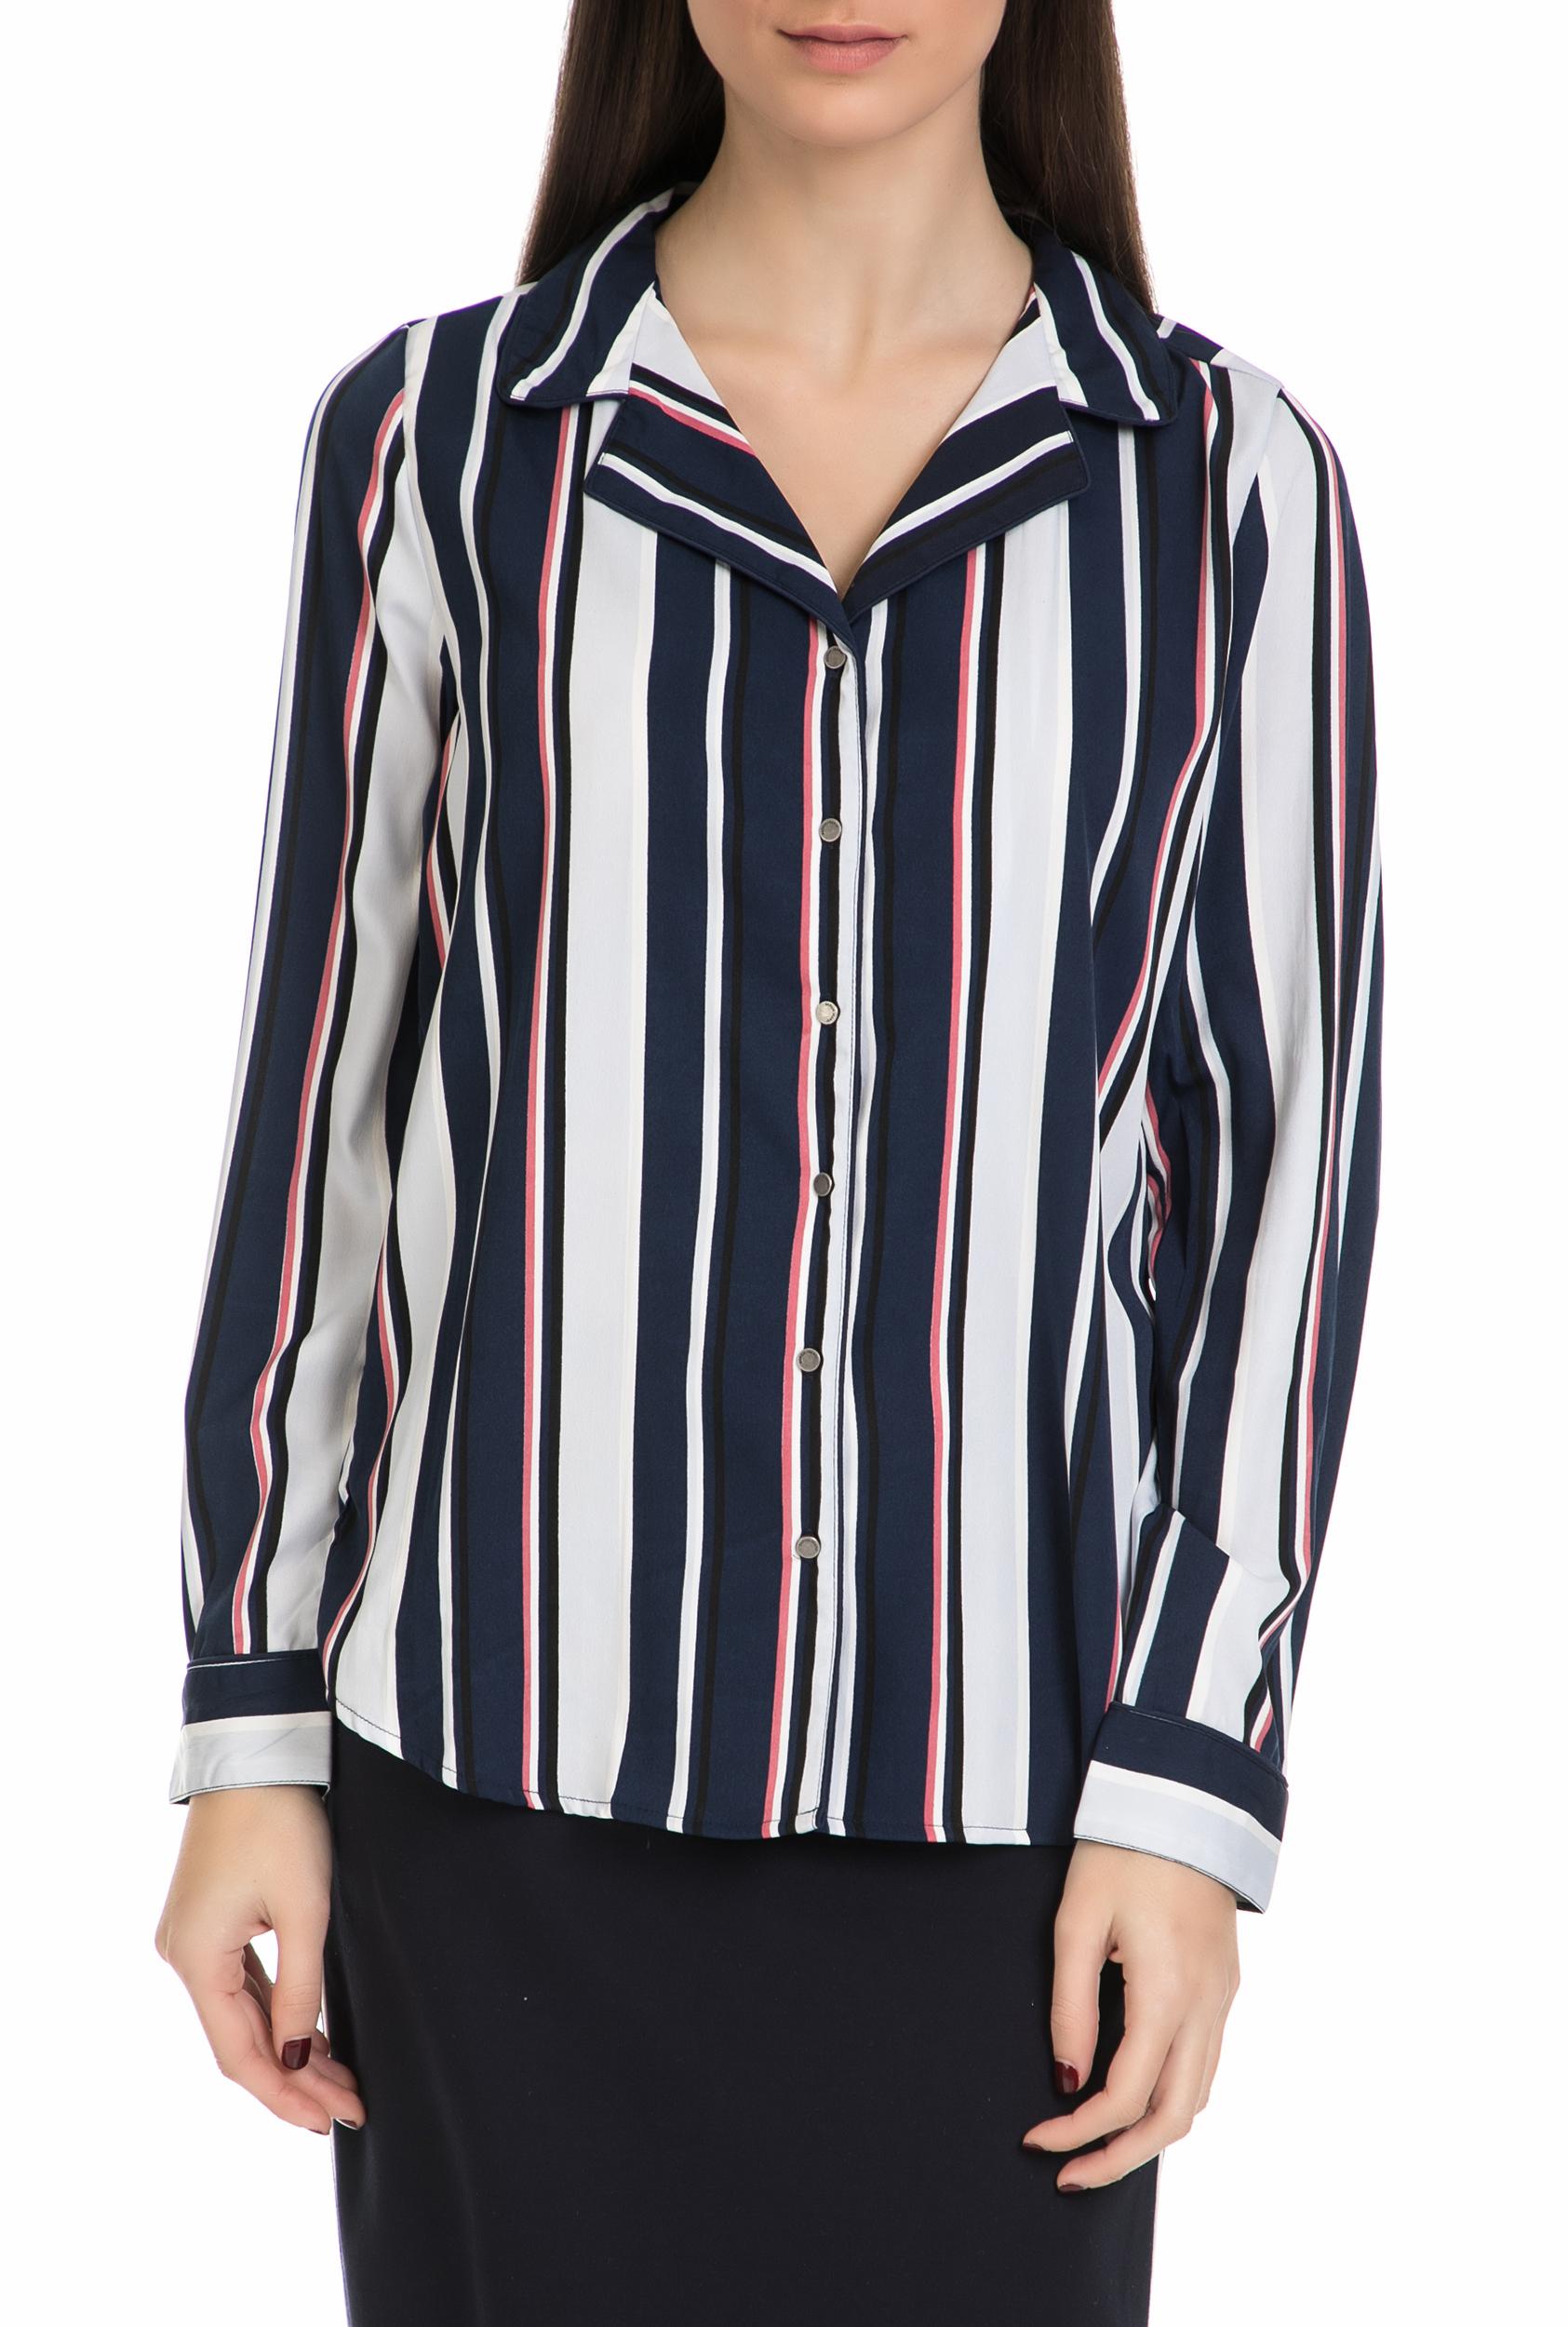 251d2359c107 GARCIA JEANS - Γυναικείο μακρυμάνικο πουκάμισο Garcia Jeans μπλε - λευκό -  κόκκινο